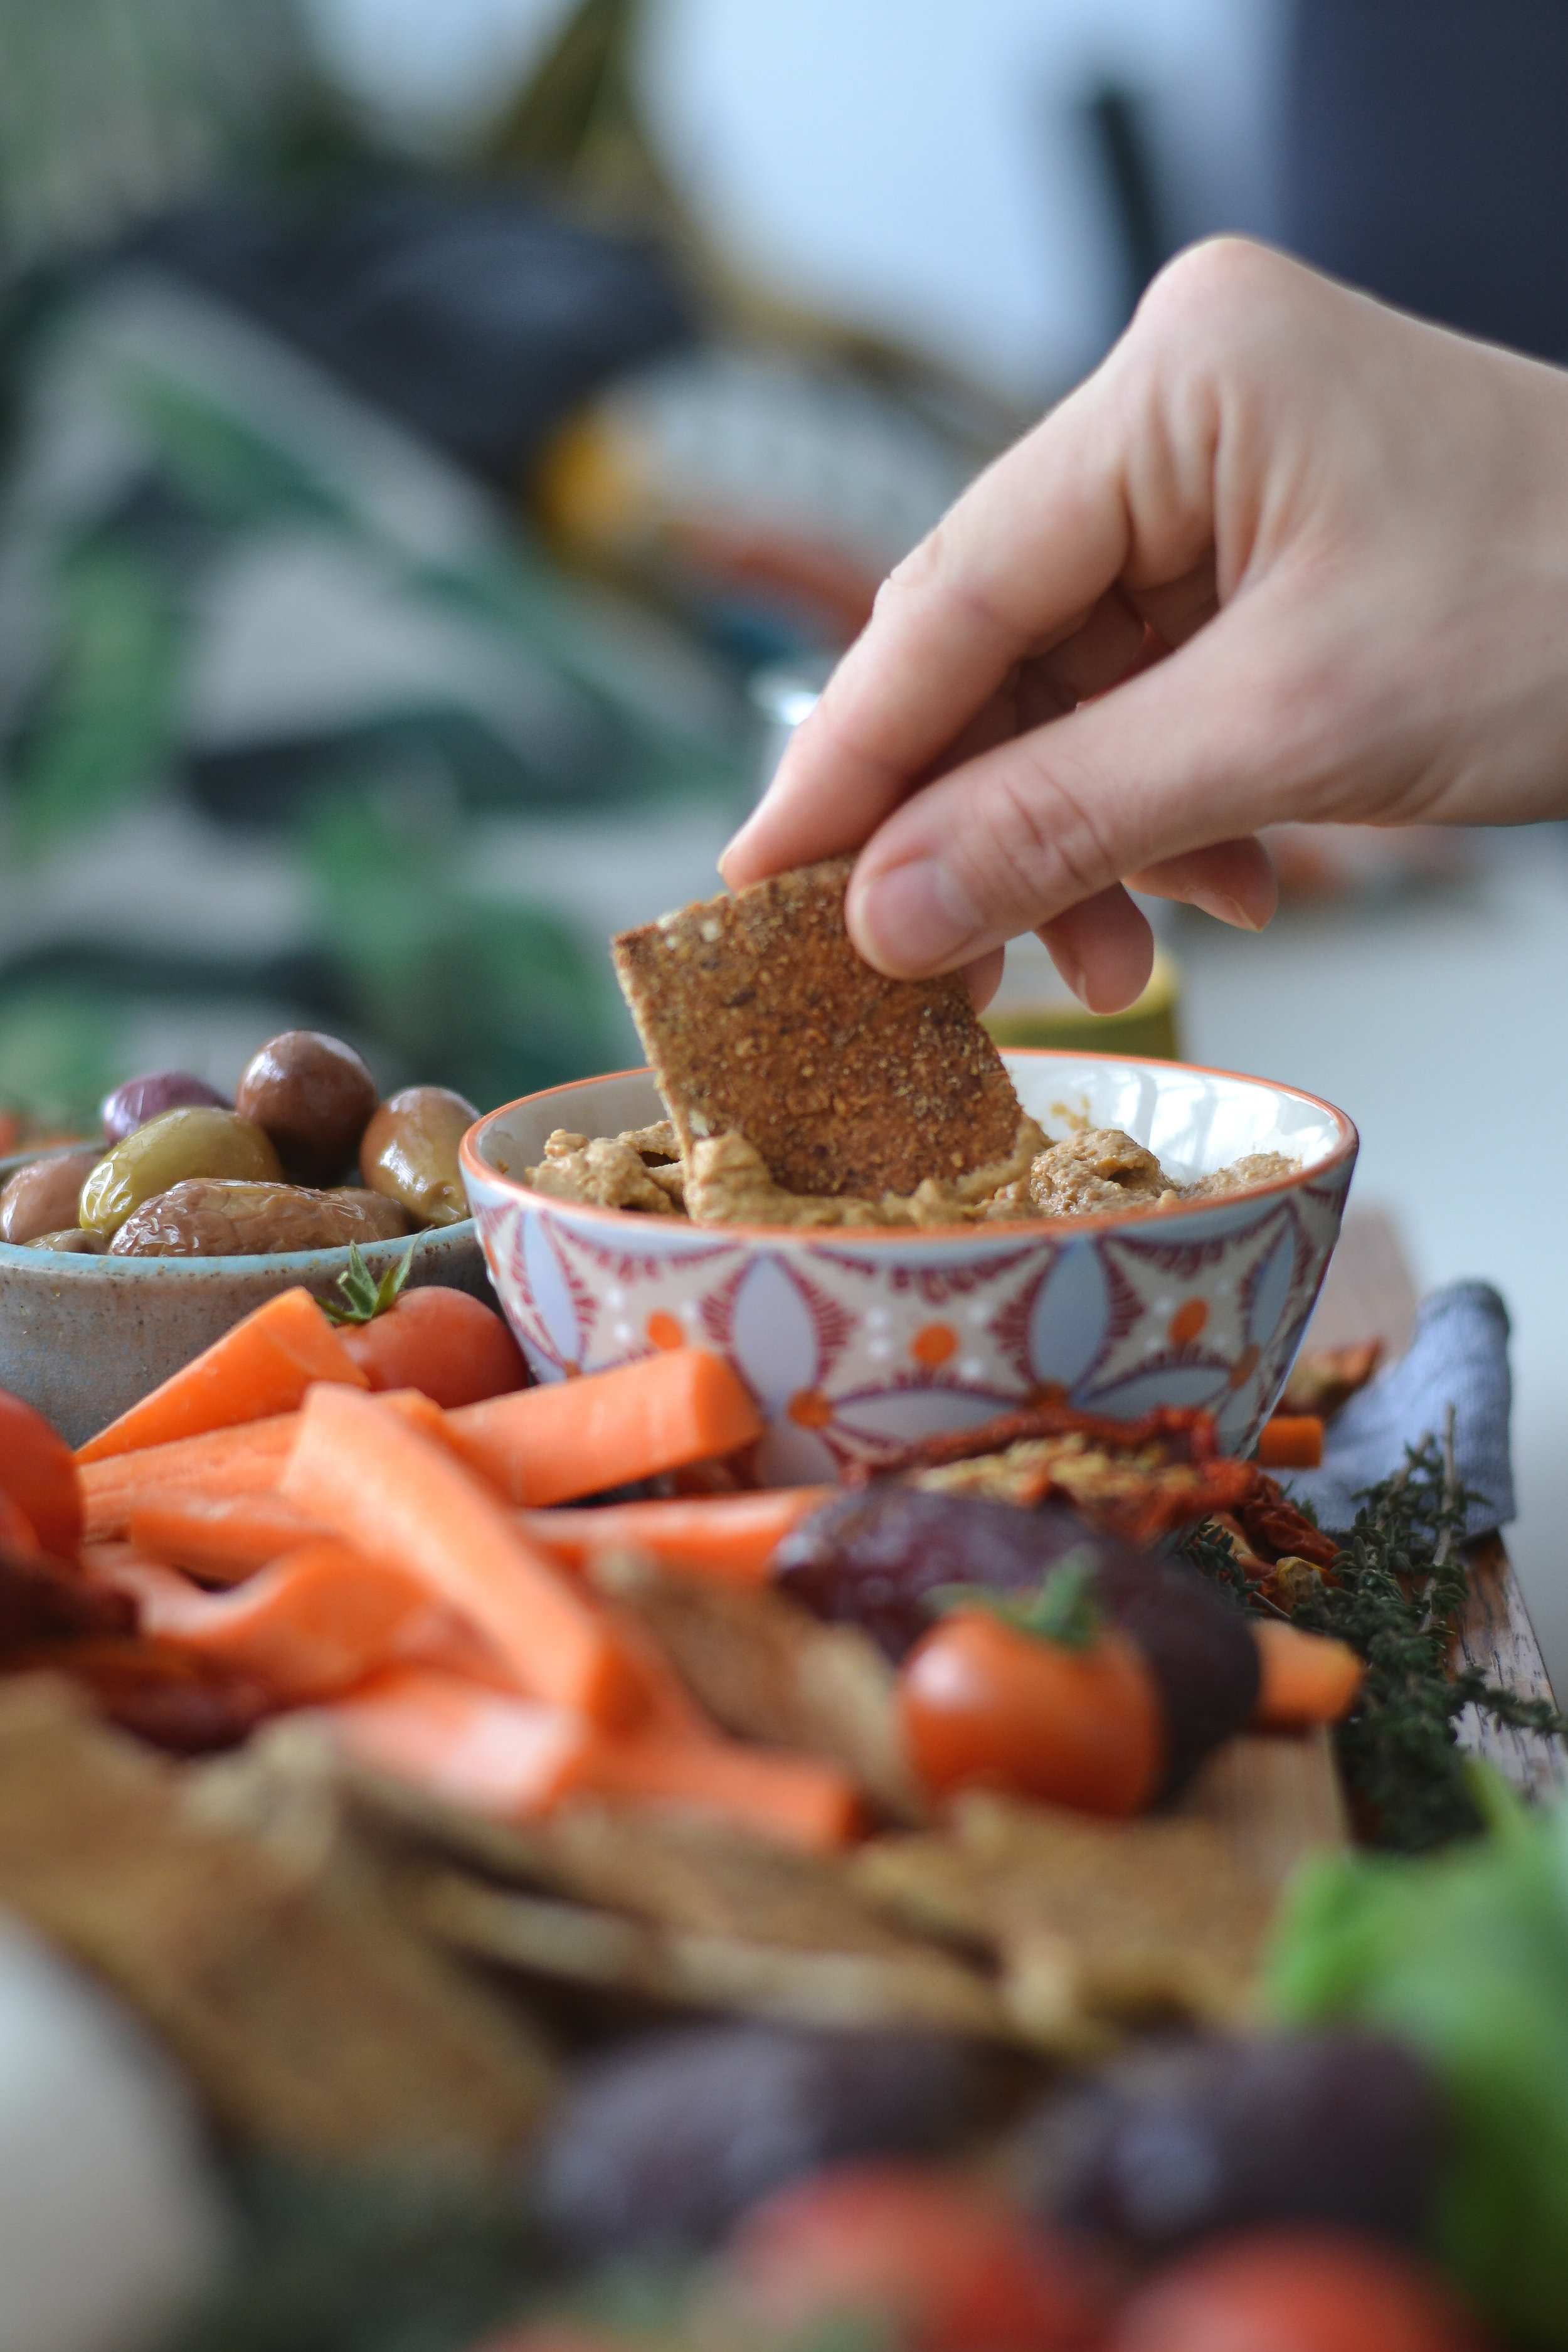 Smokey Eggplant Dip | Plant-Based vegan, oil-free, dip or sandwich spread, healthy appetizer